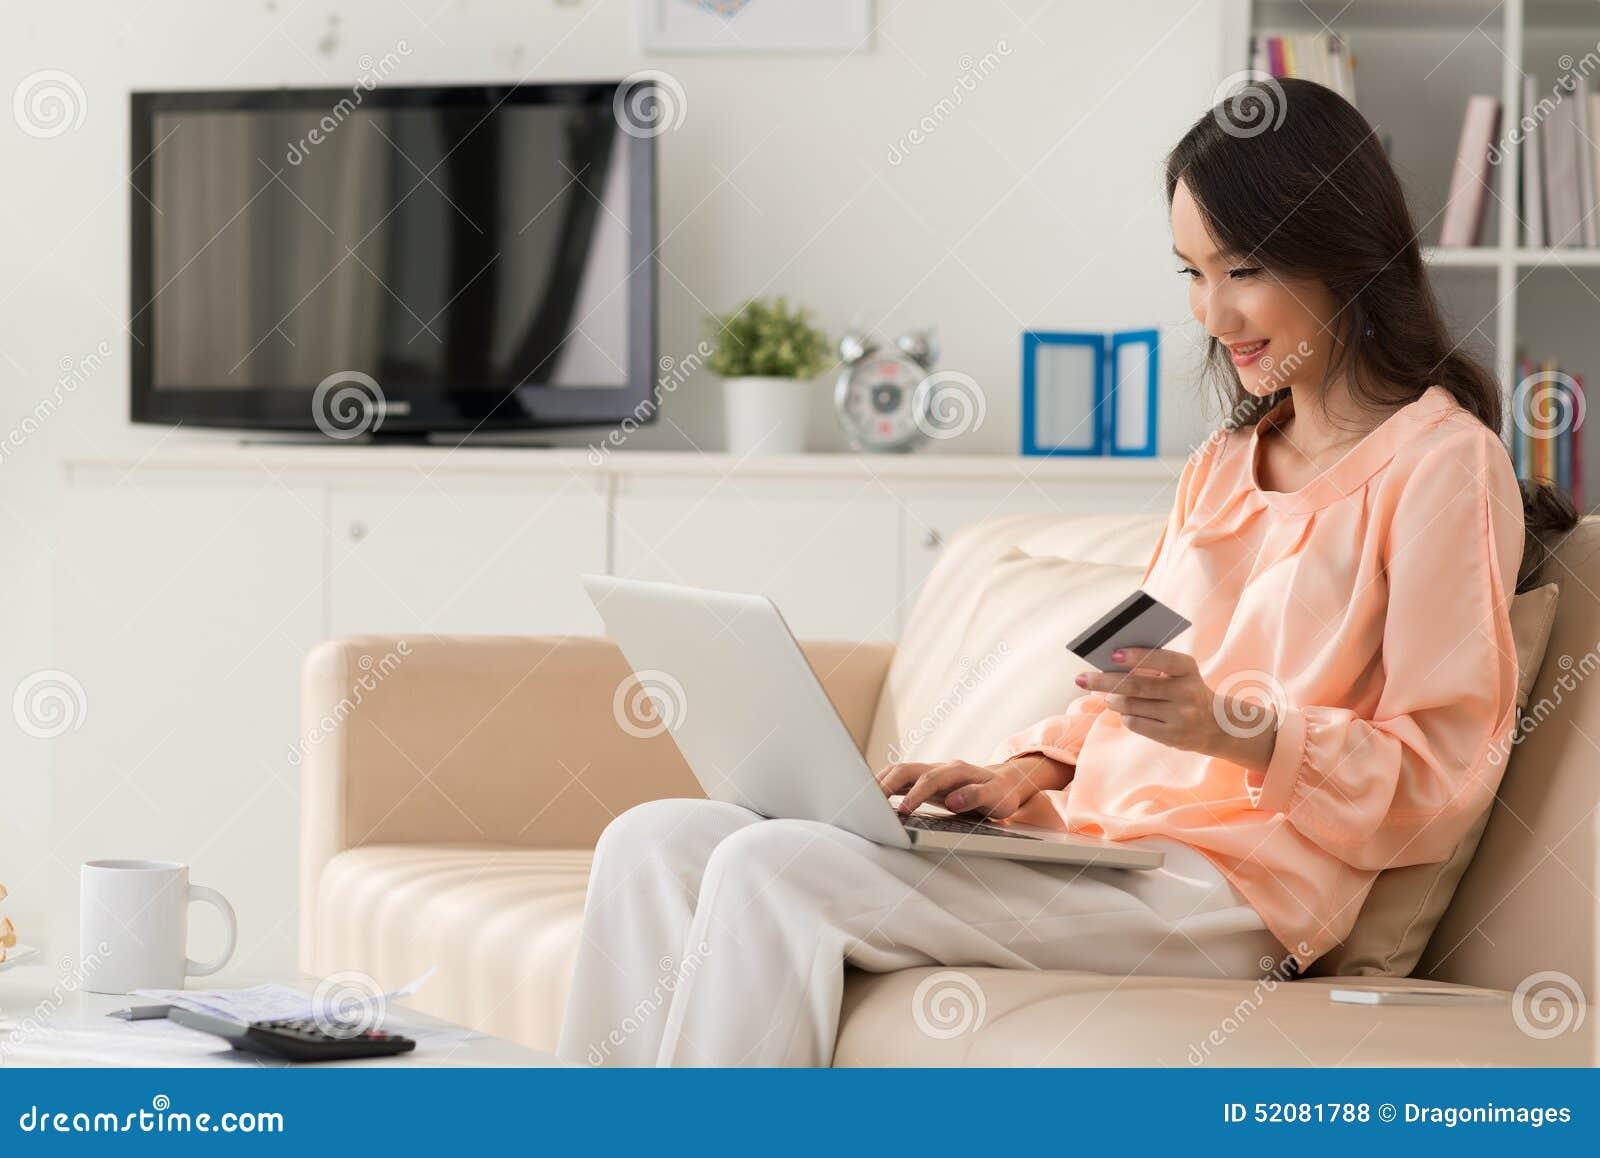 online shopping stock photo image 52081788. Black Bedroom Furniture Sets. Home Design Ideas